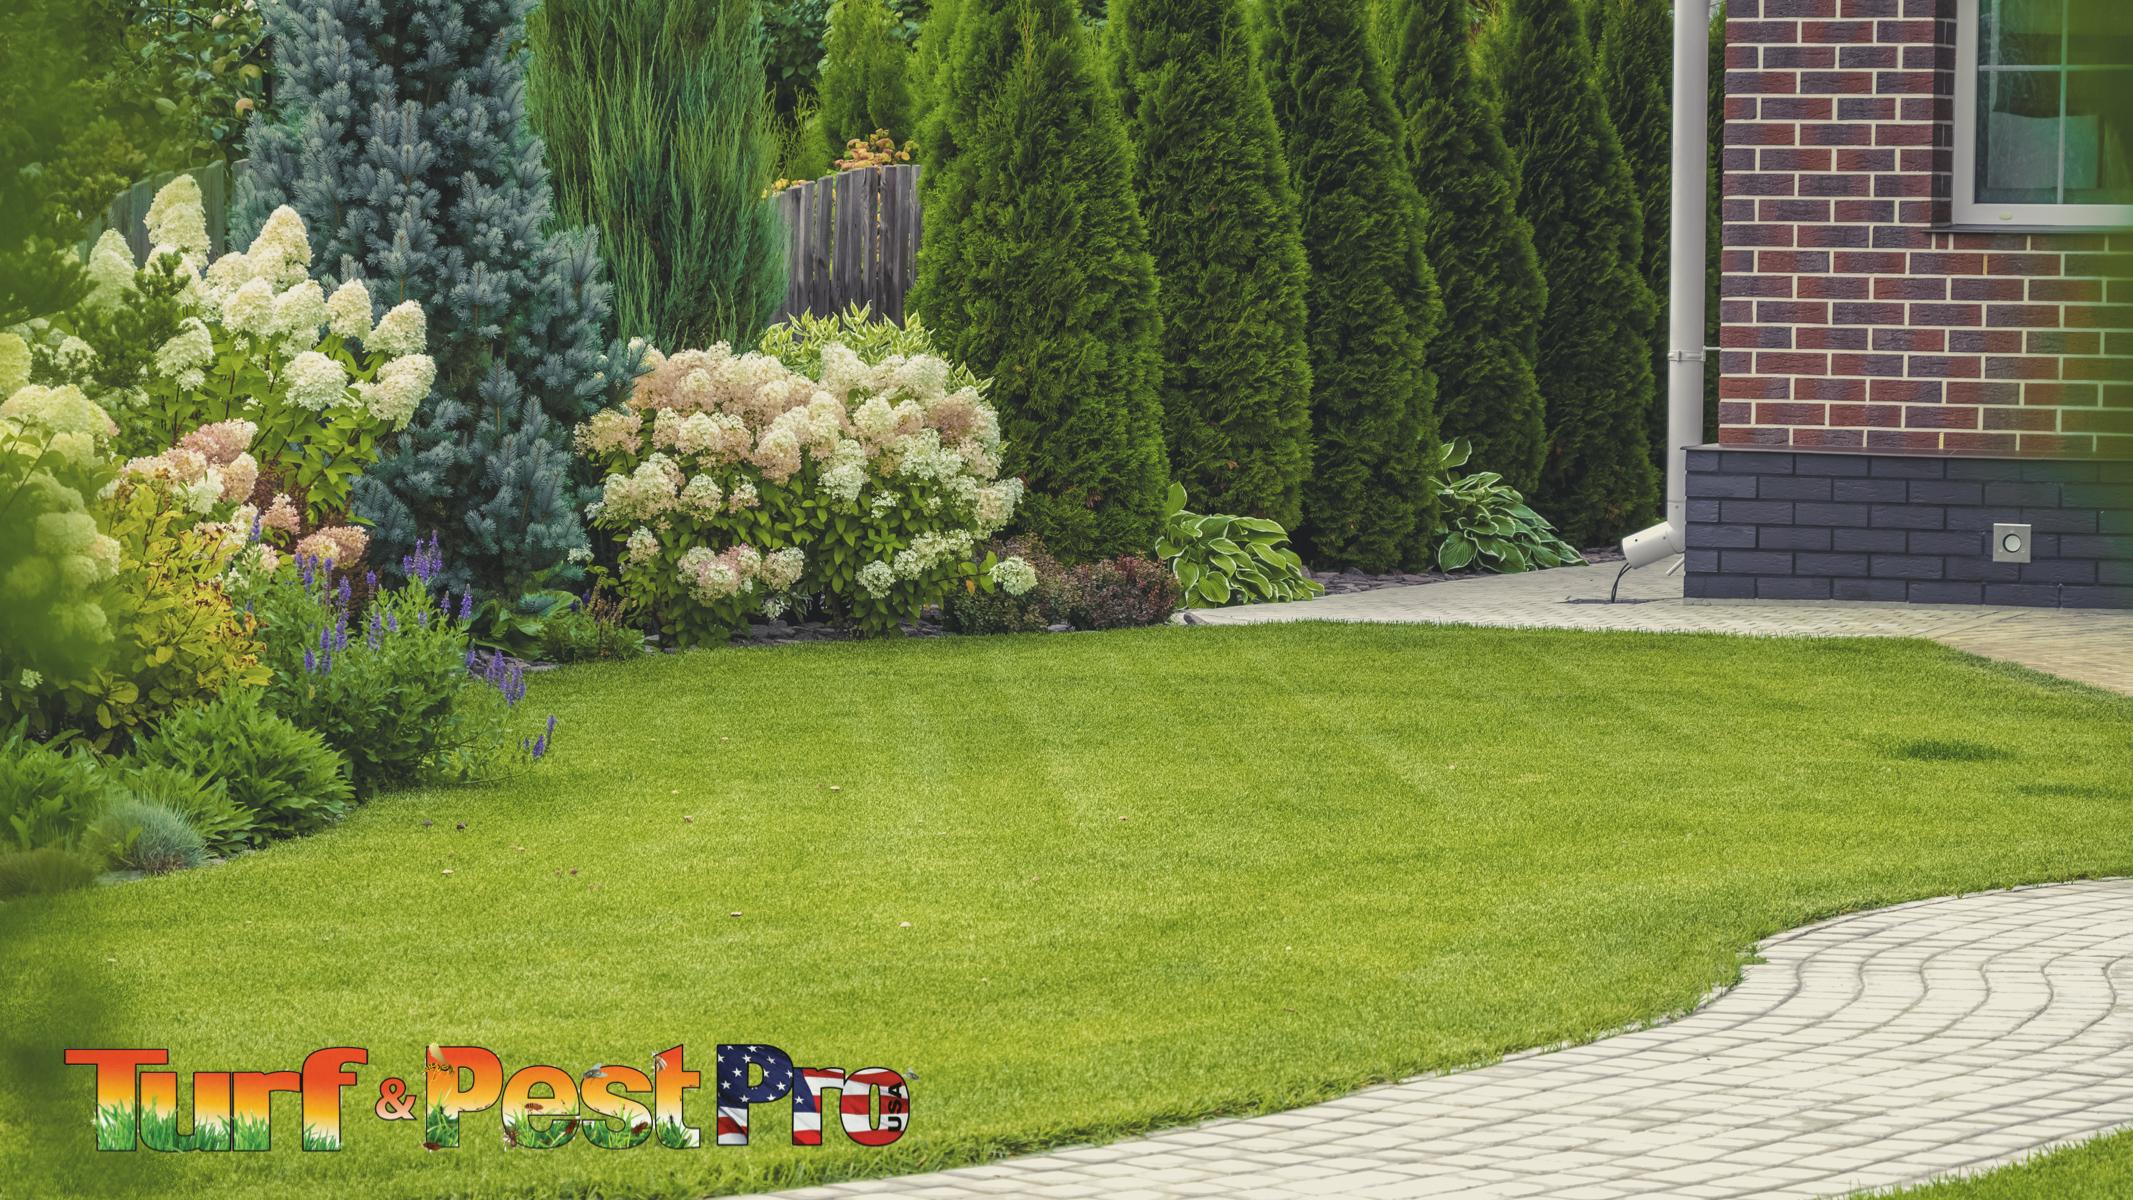 Turf & Pest Pro USA Tree & Shrub Care